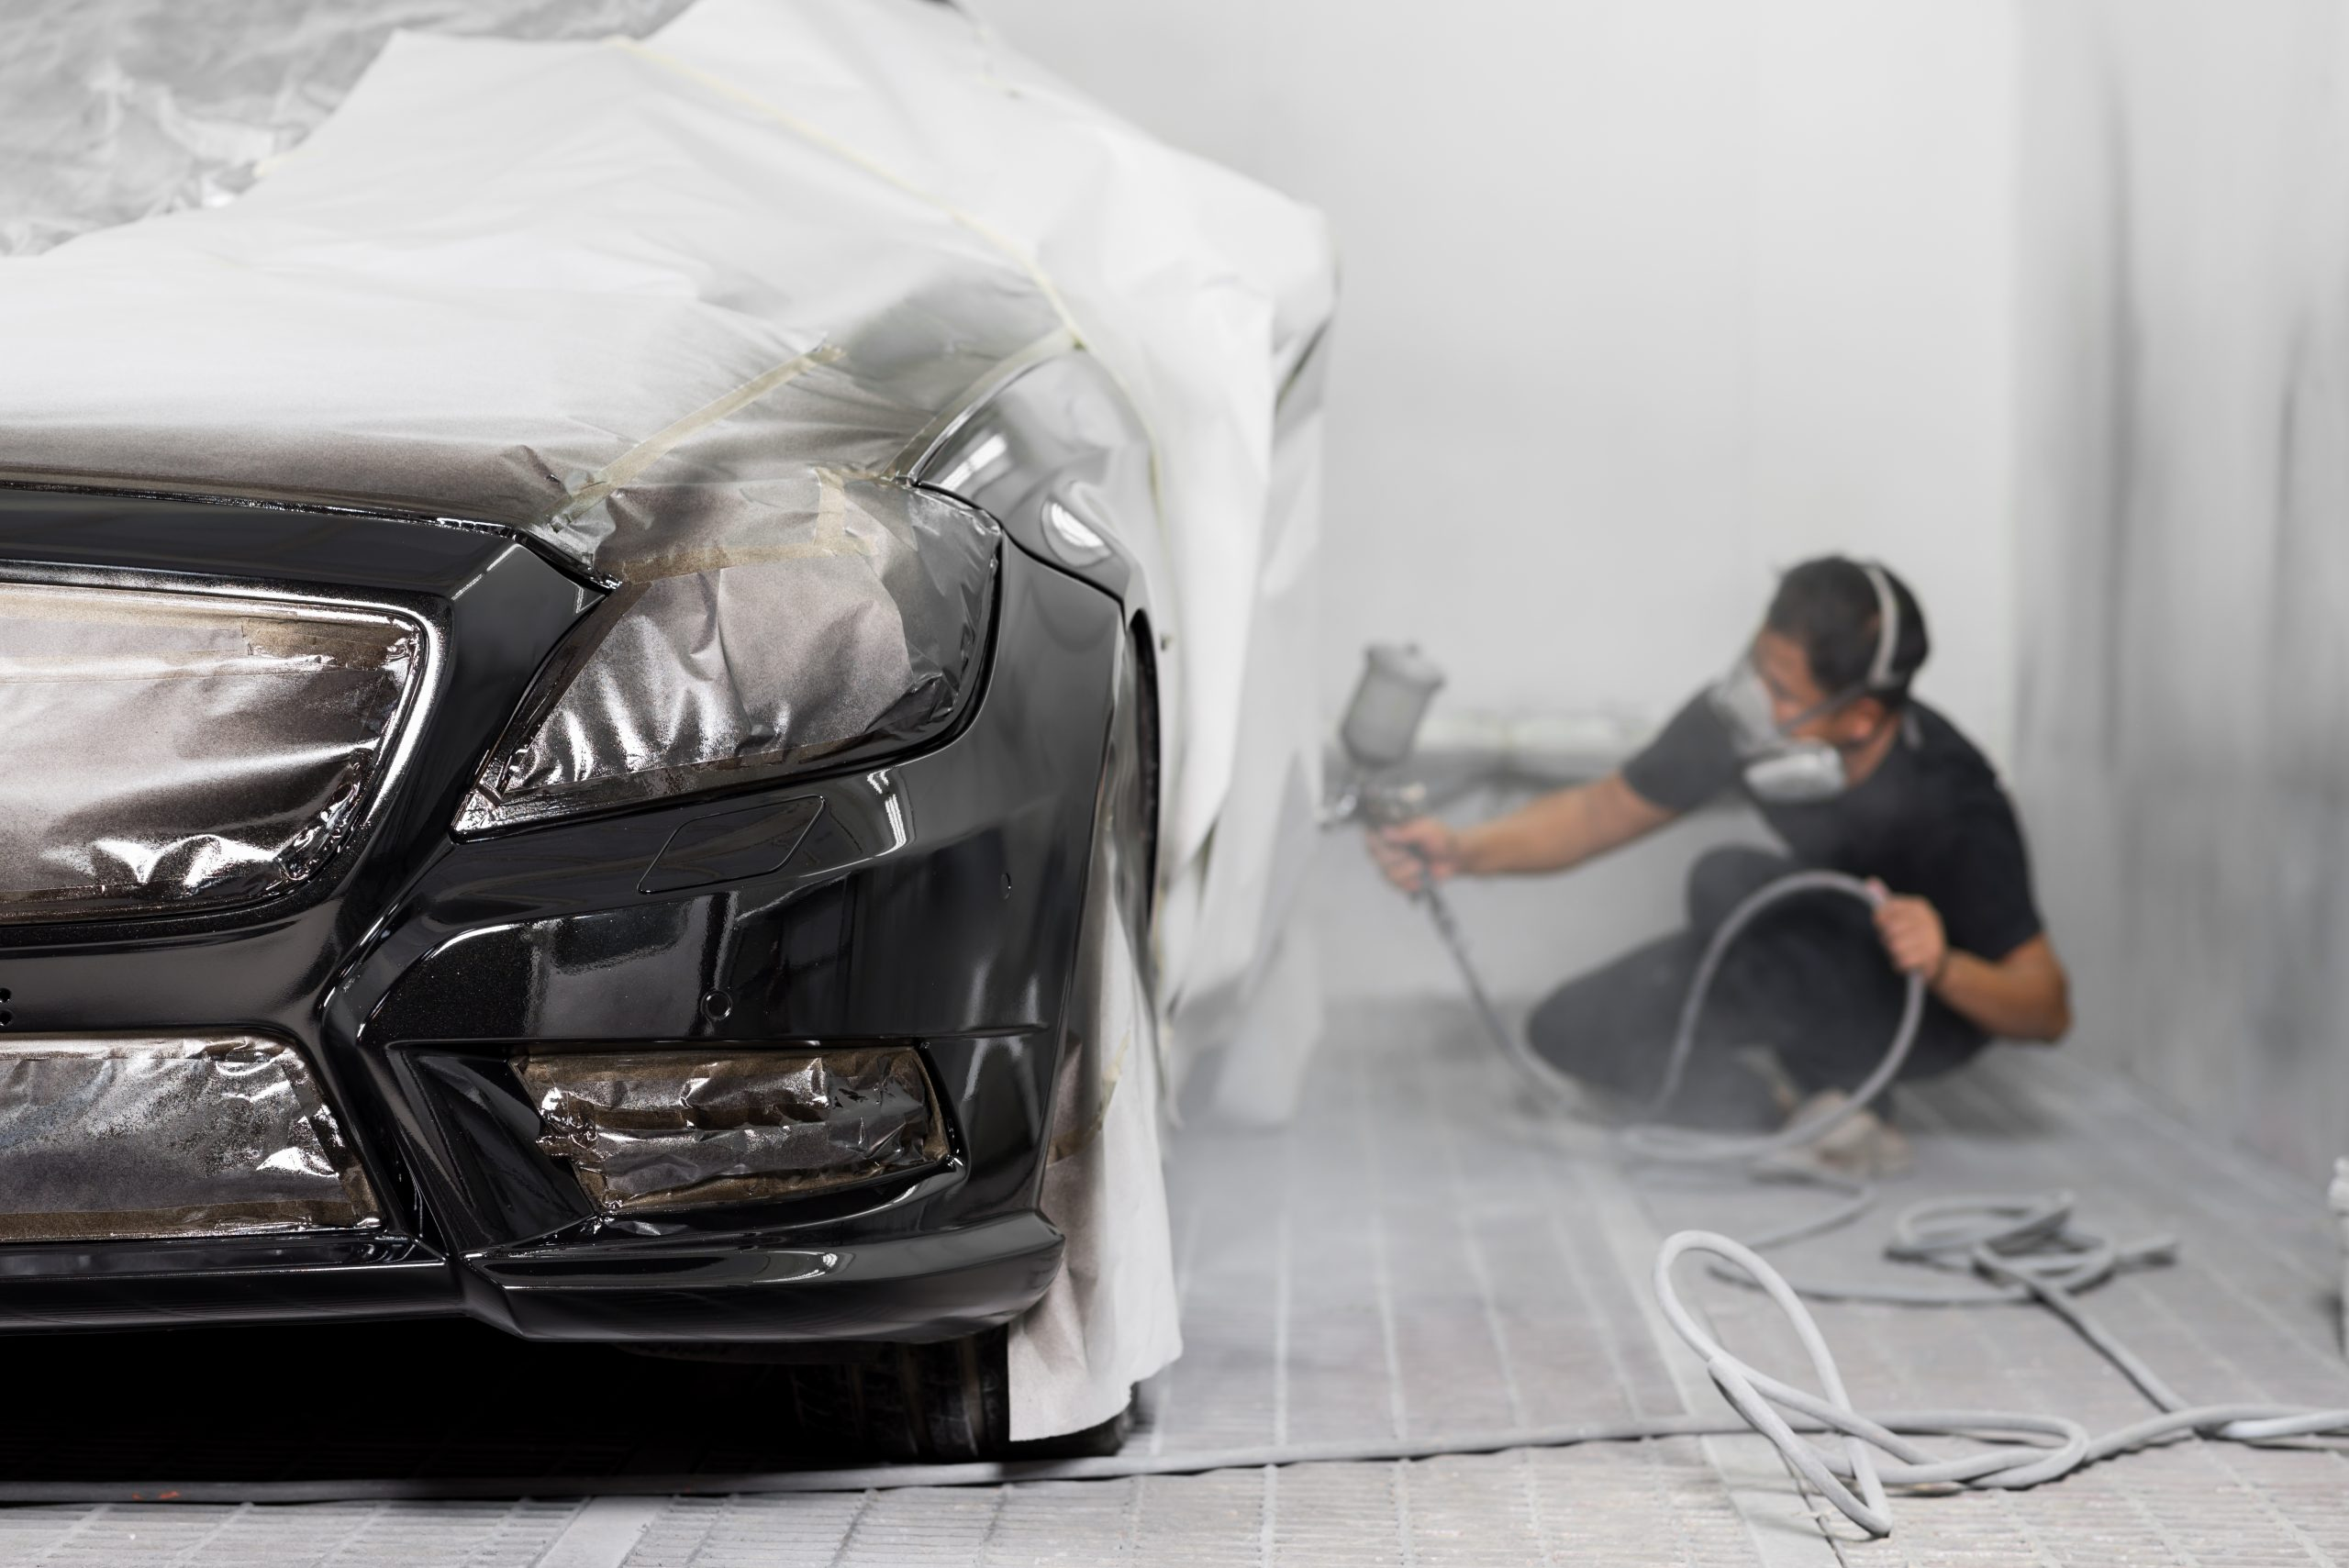 technician spraying paint on a black vehicle